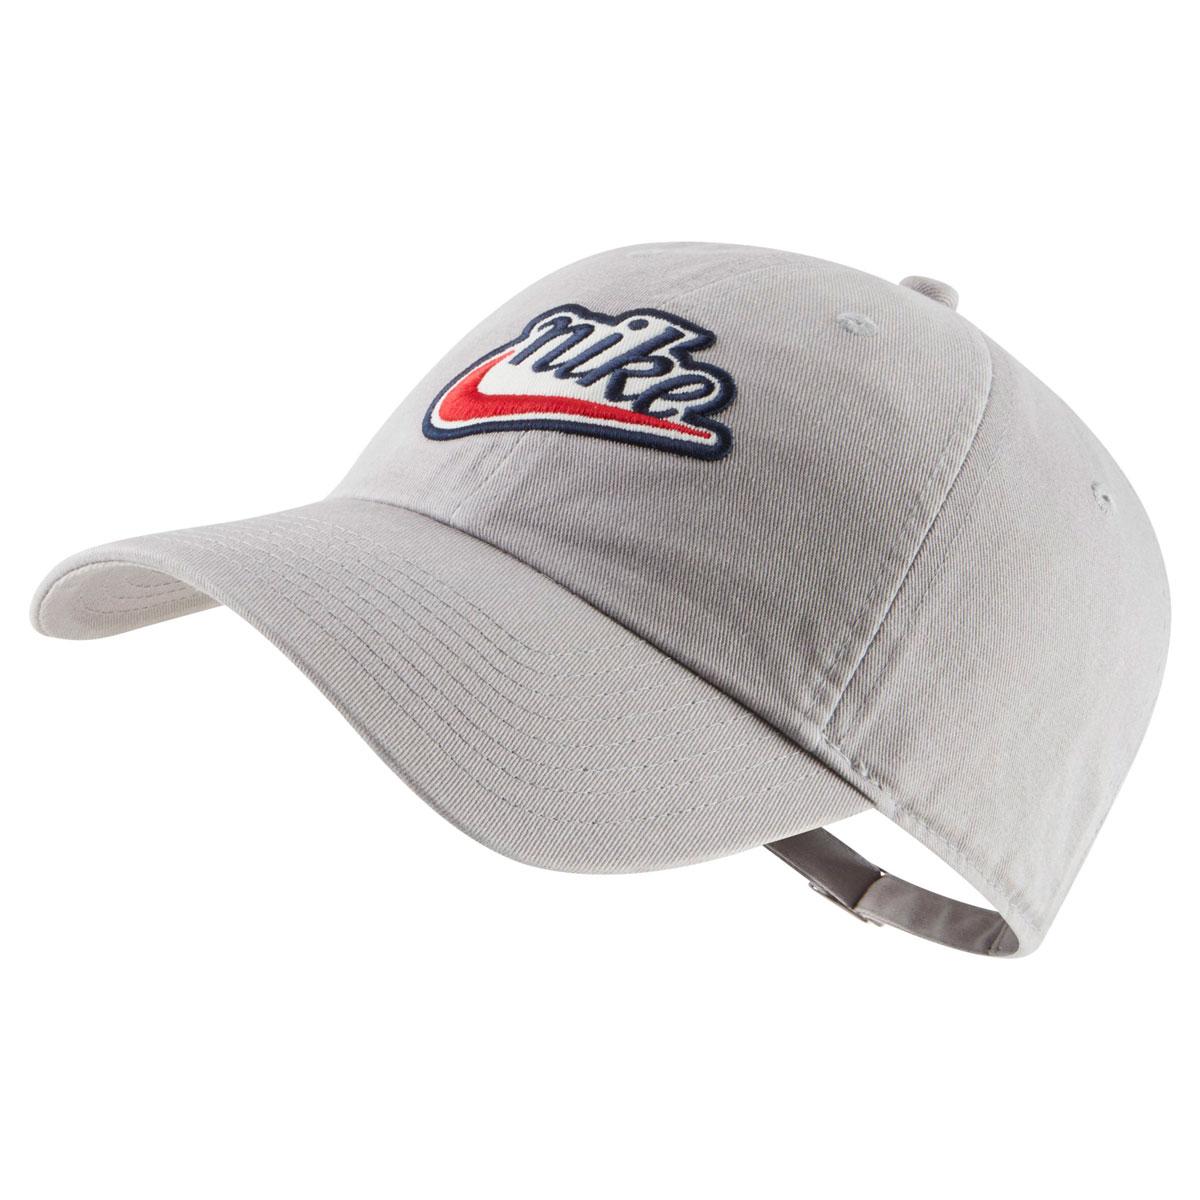 Men's Usa Nsw H86 Cap, Gray, swatch